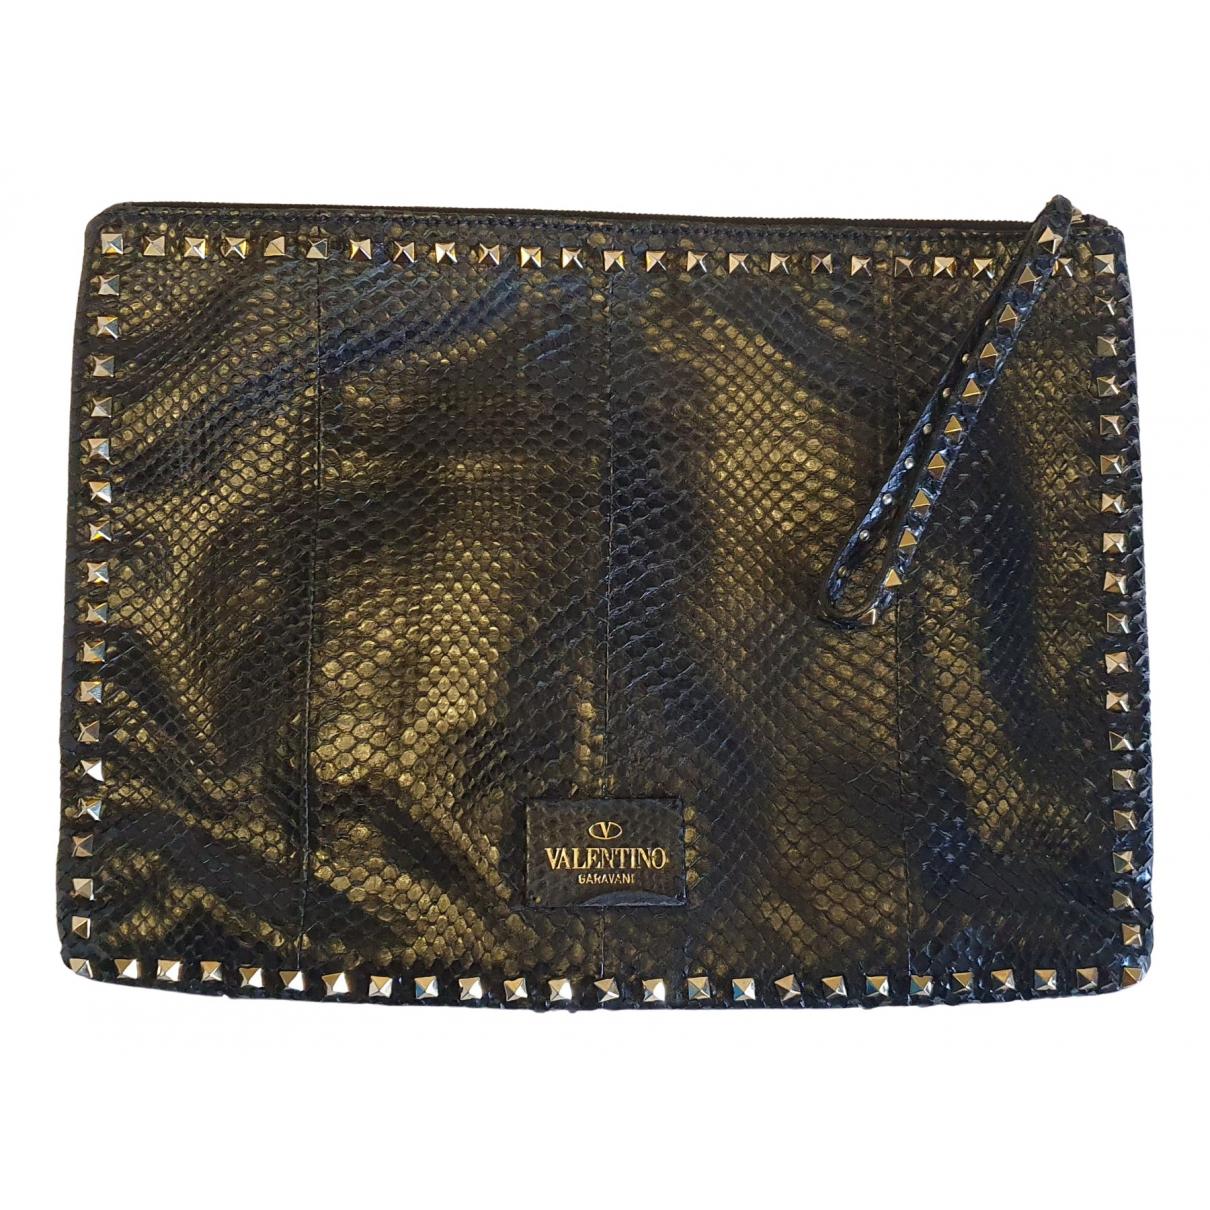 Valentino Garavani \N Black Leather Clutch bag for Women \N